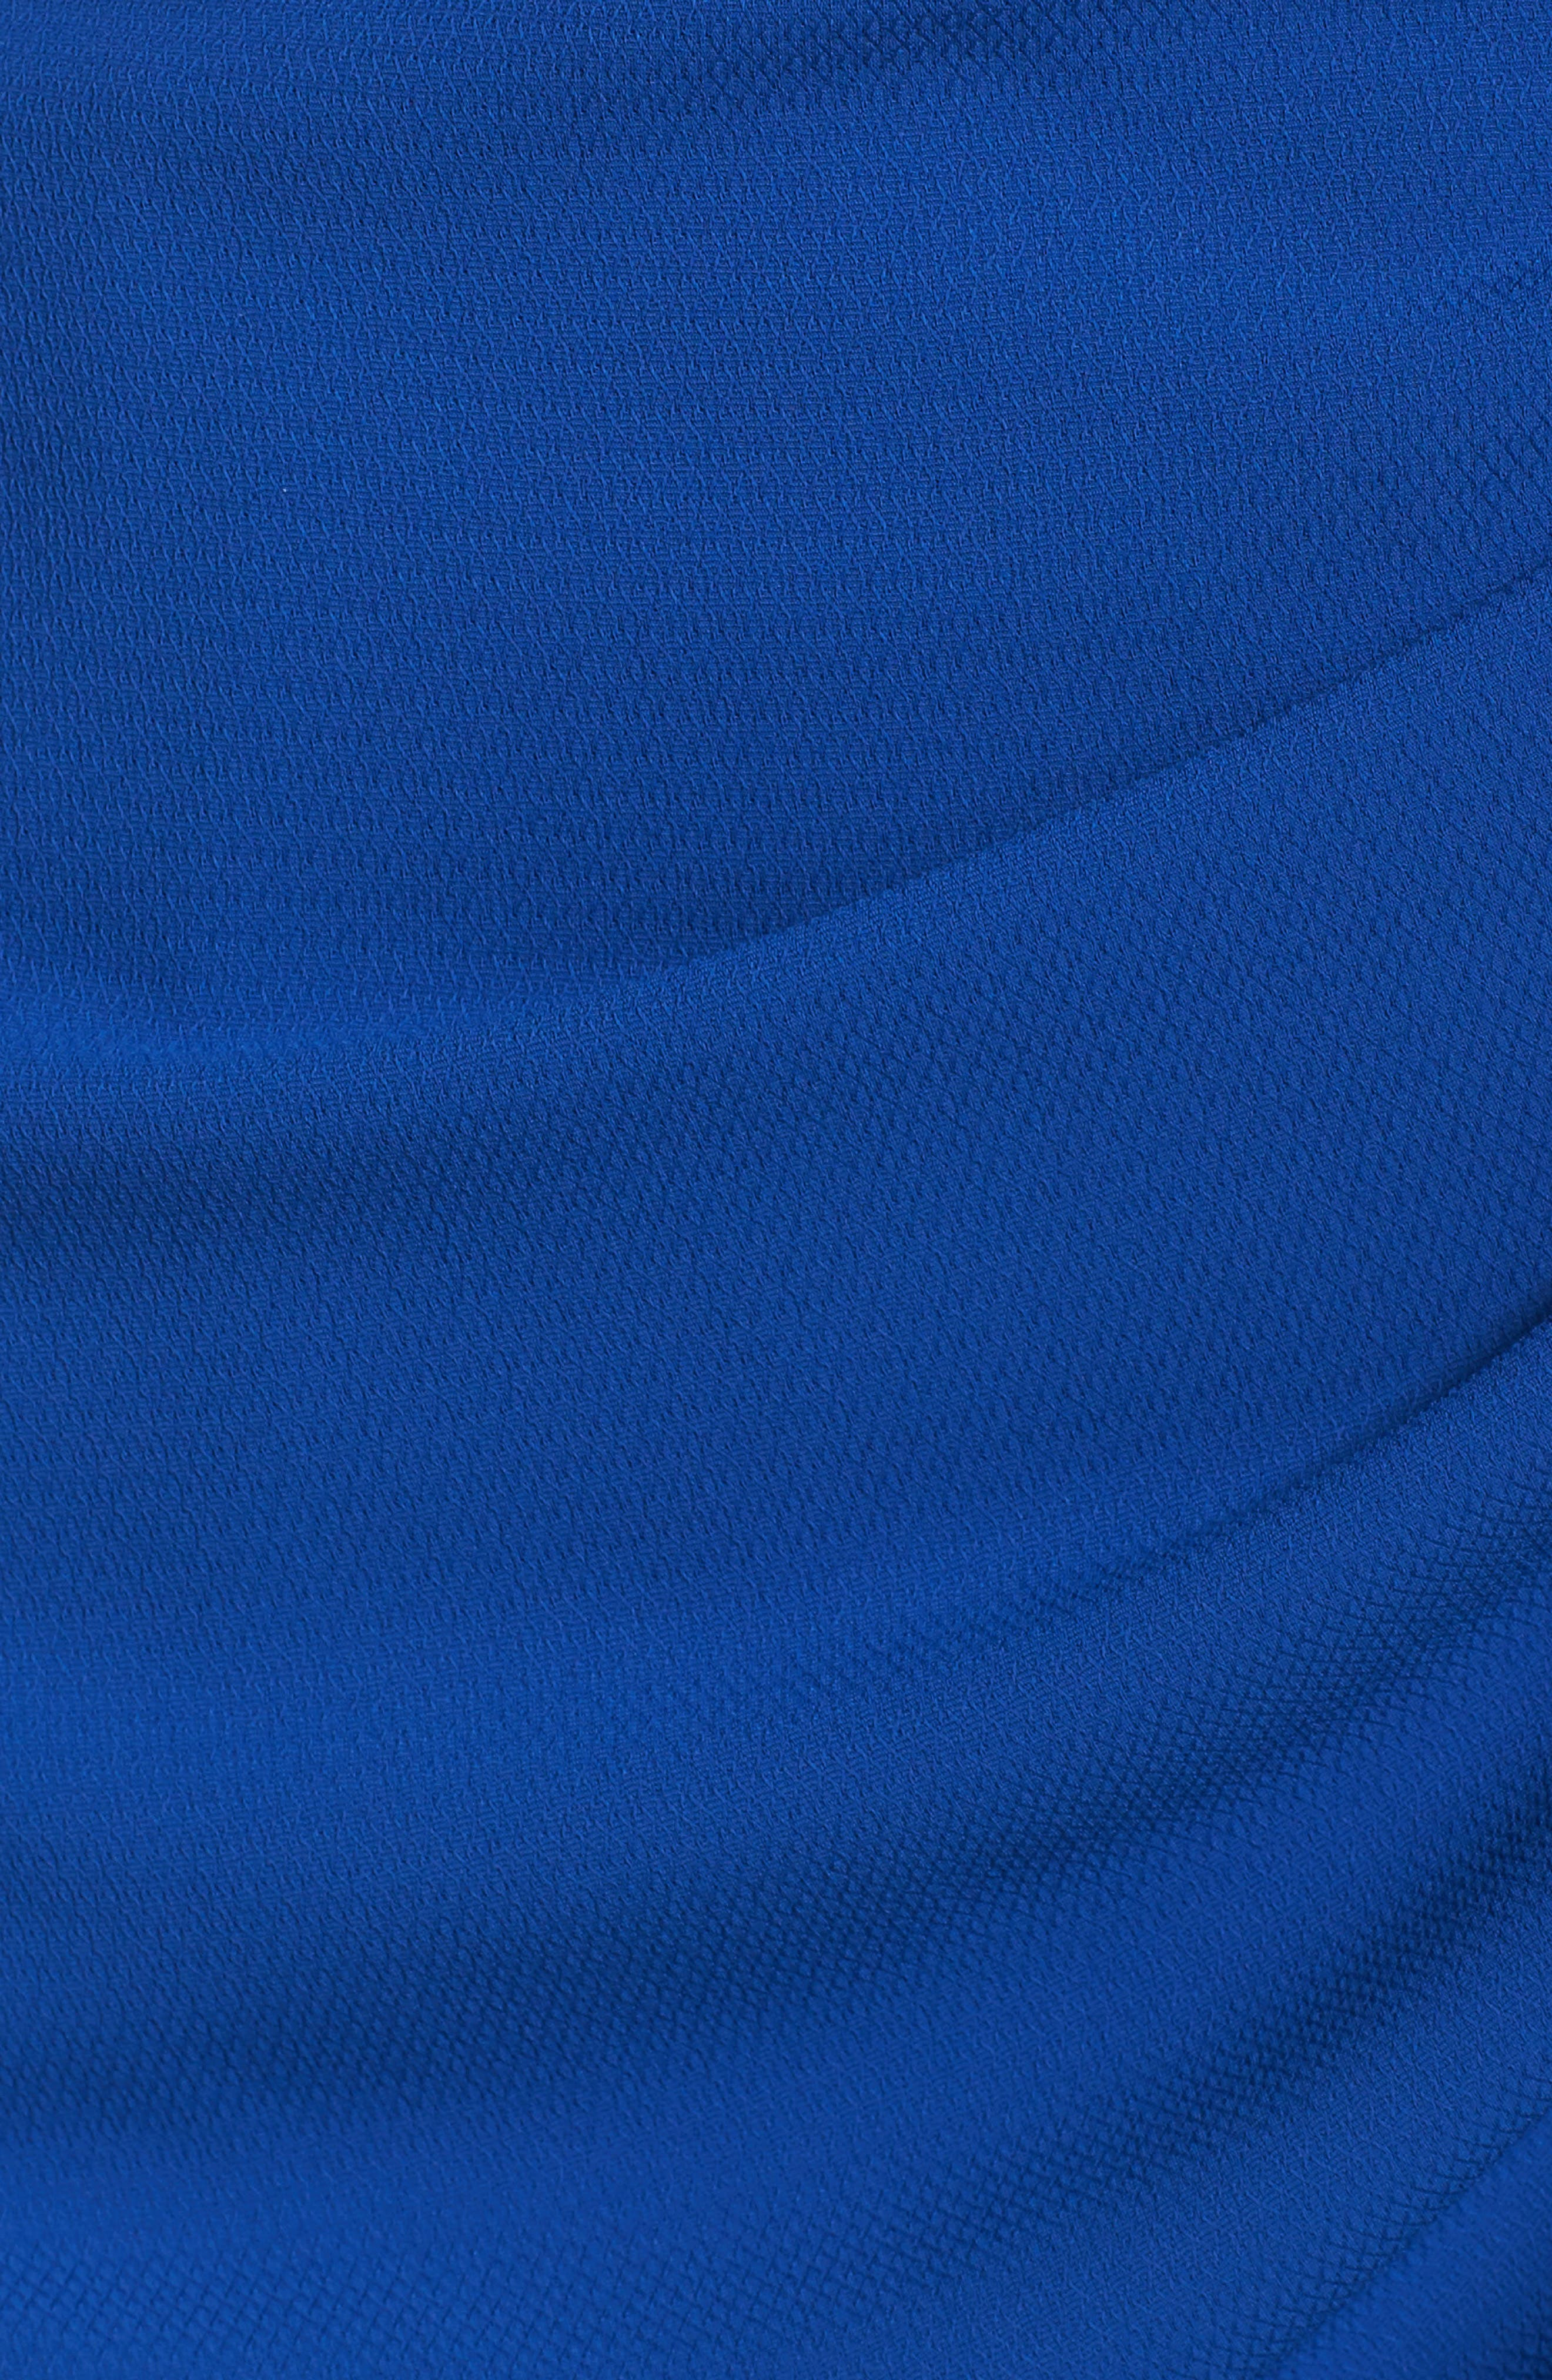 Camilla Frill Sheath Dress,                             Alternate thumbnail 6, color,                             460